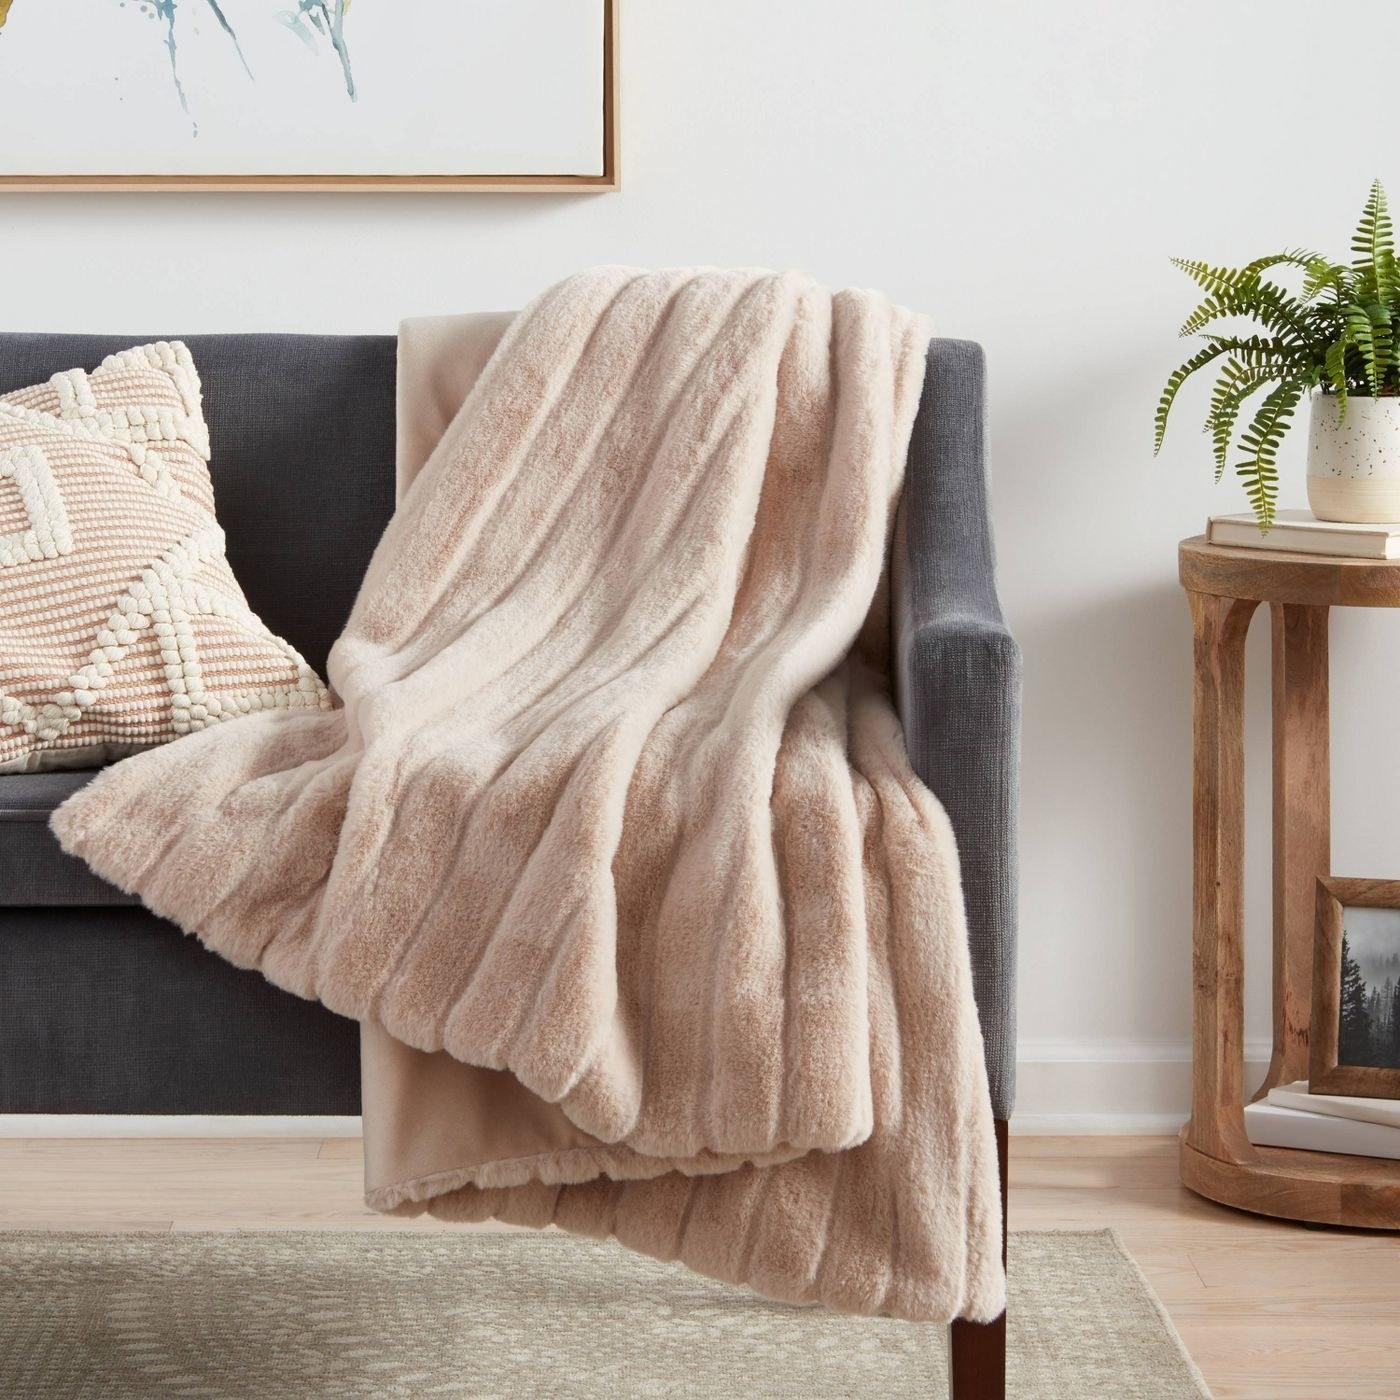 the tan blanket